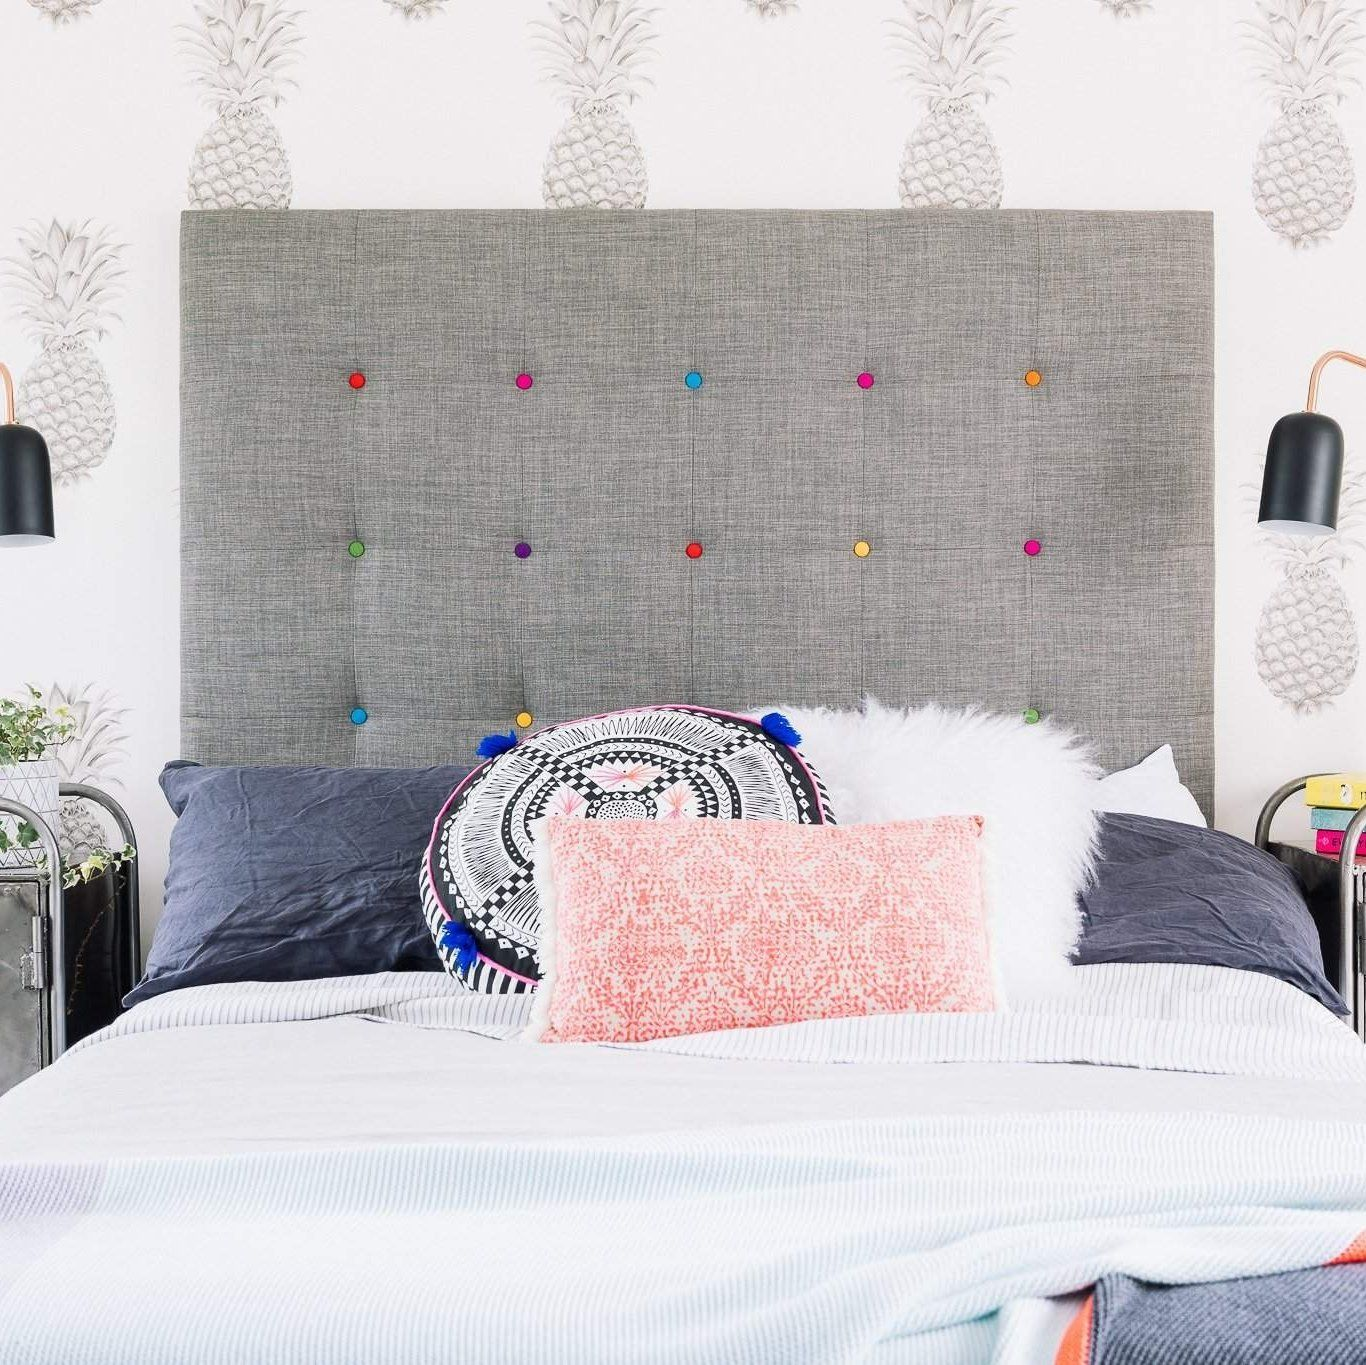 Button Pop design headboard in 2019 Headboards for beds